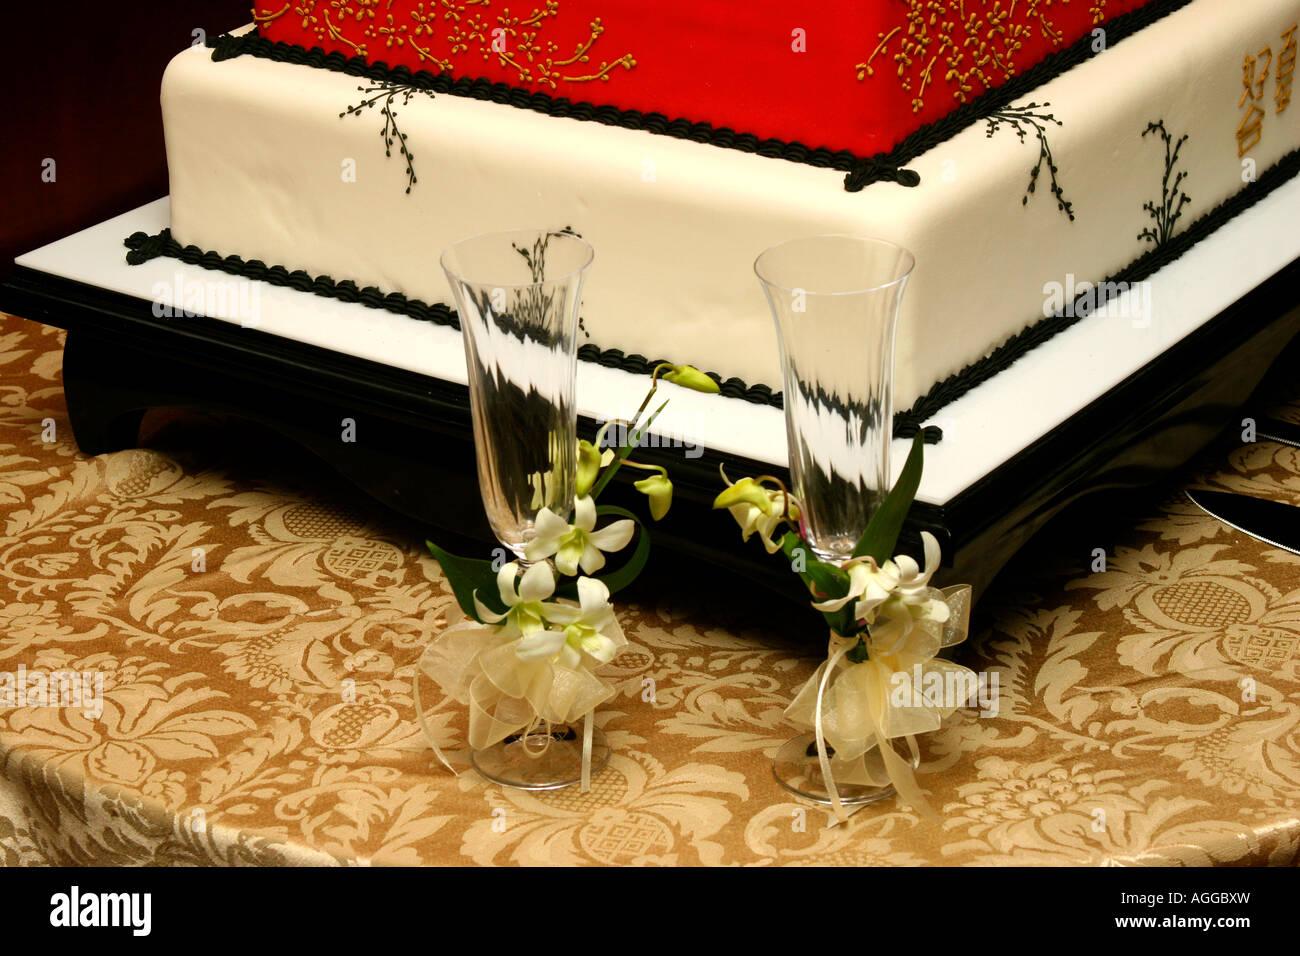 Chinese wedding cake and details Stock Photo: 14203824 - Alamy